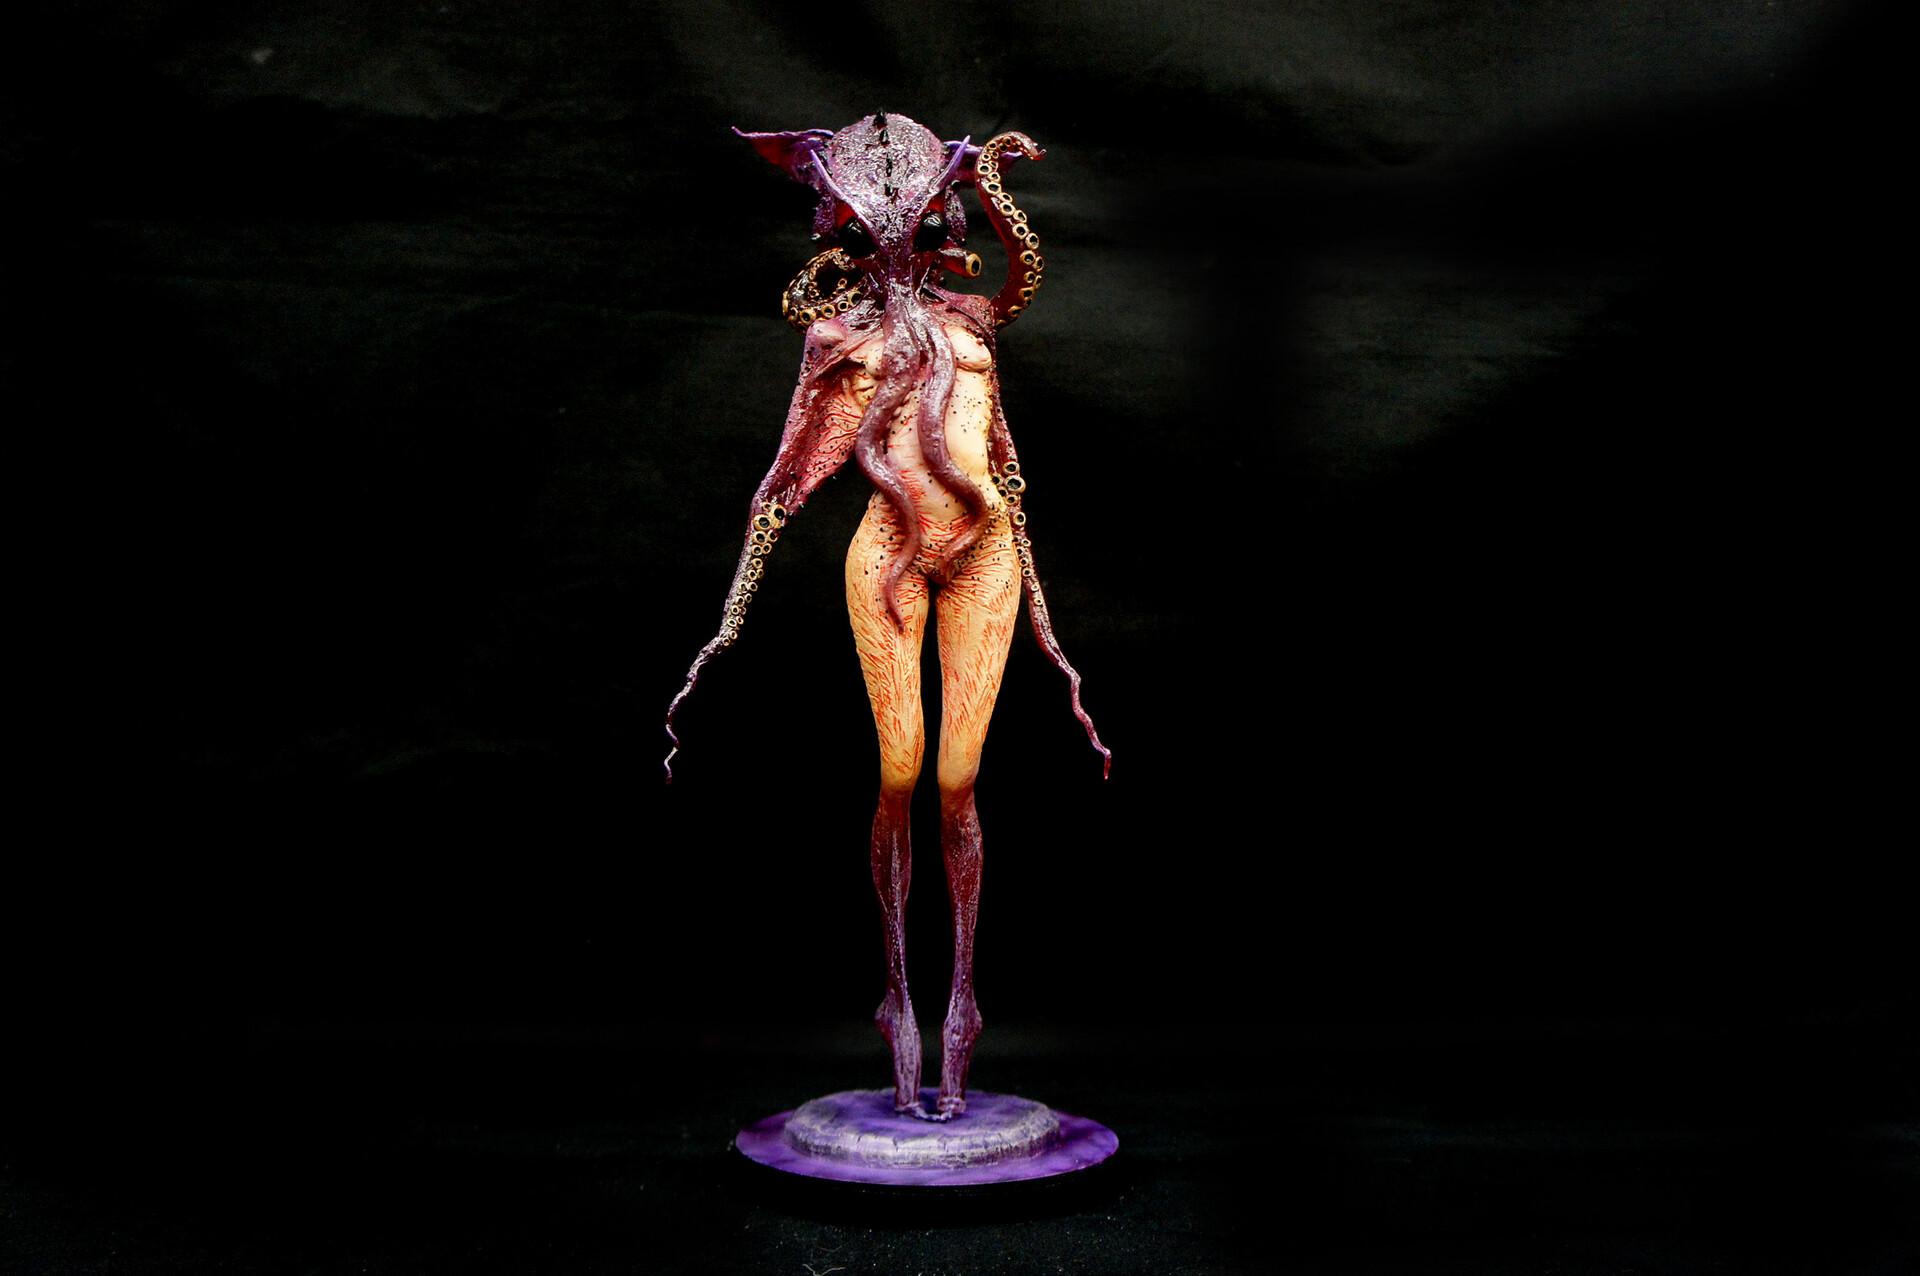 The Octopus Art Statue